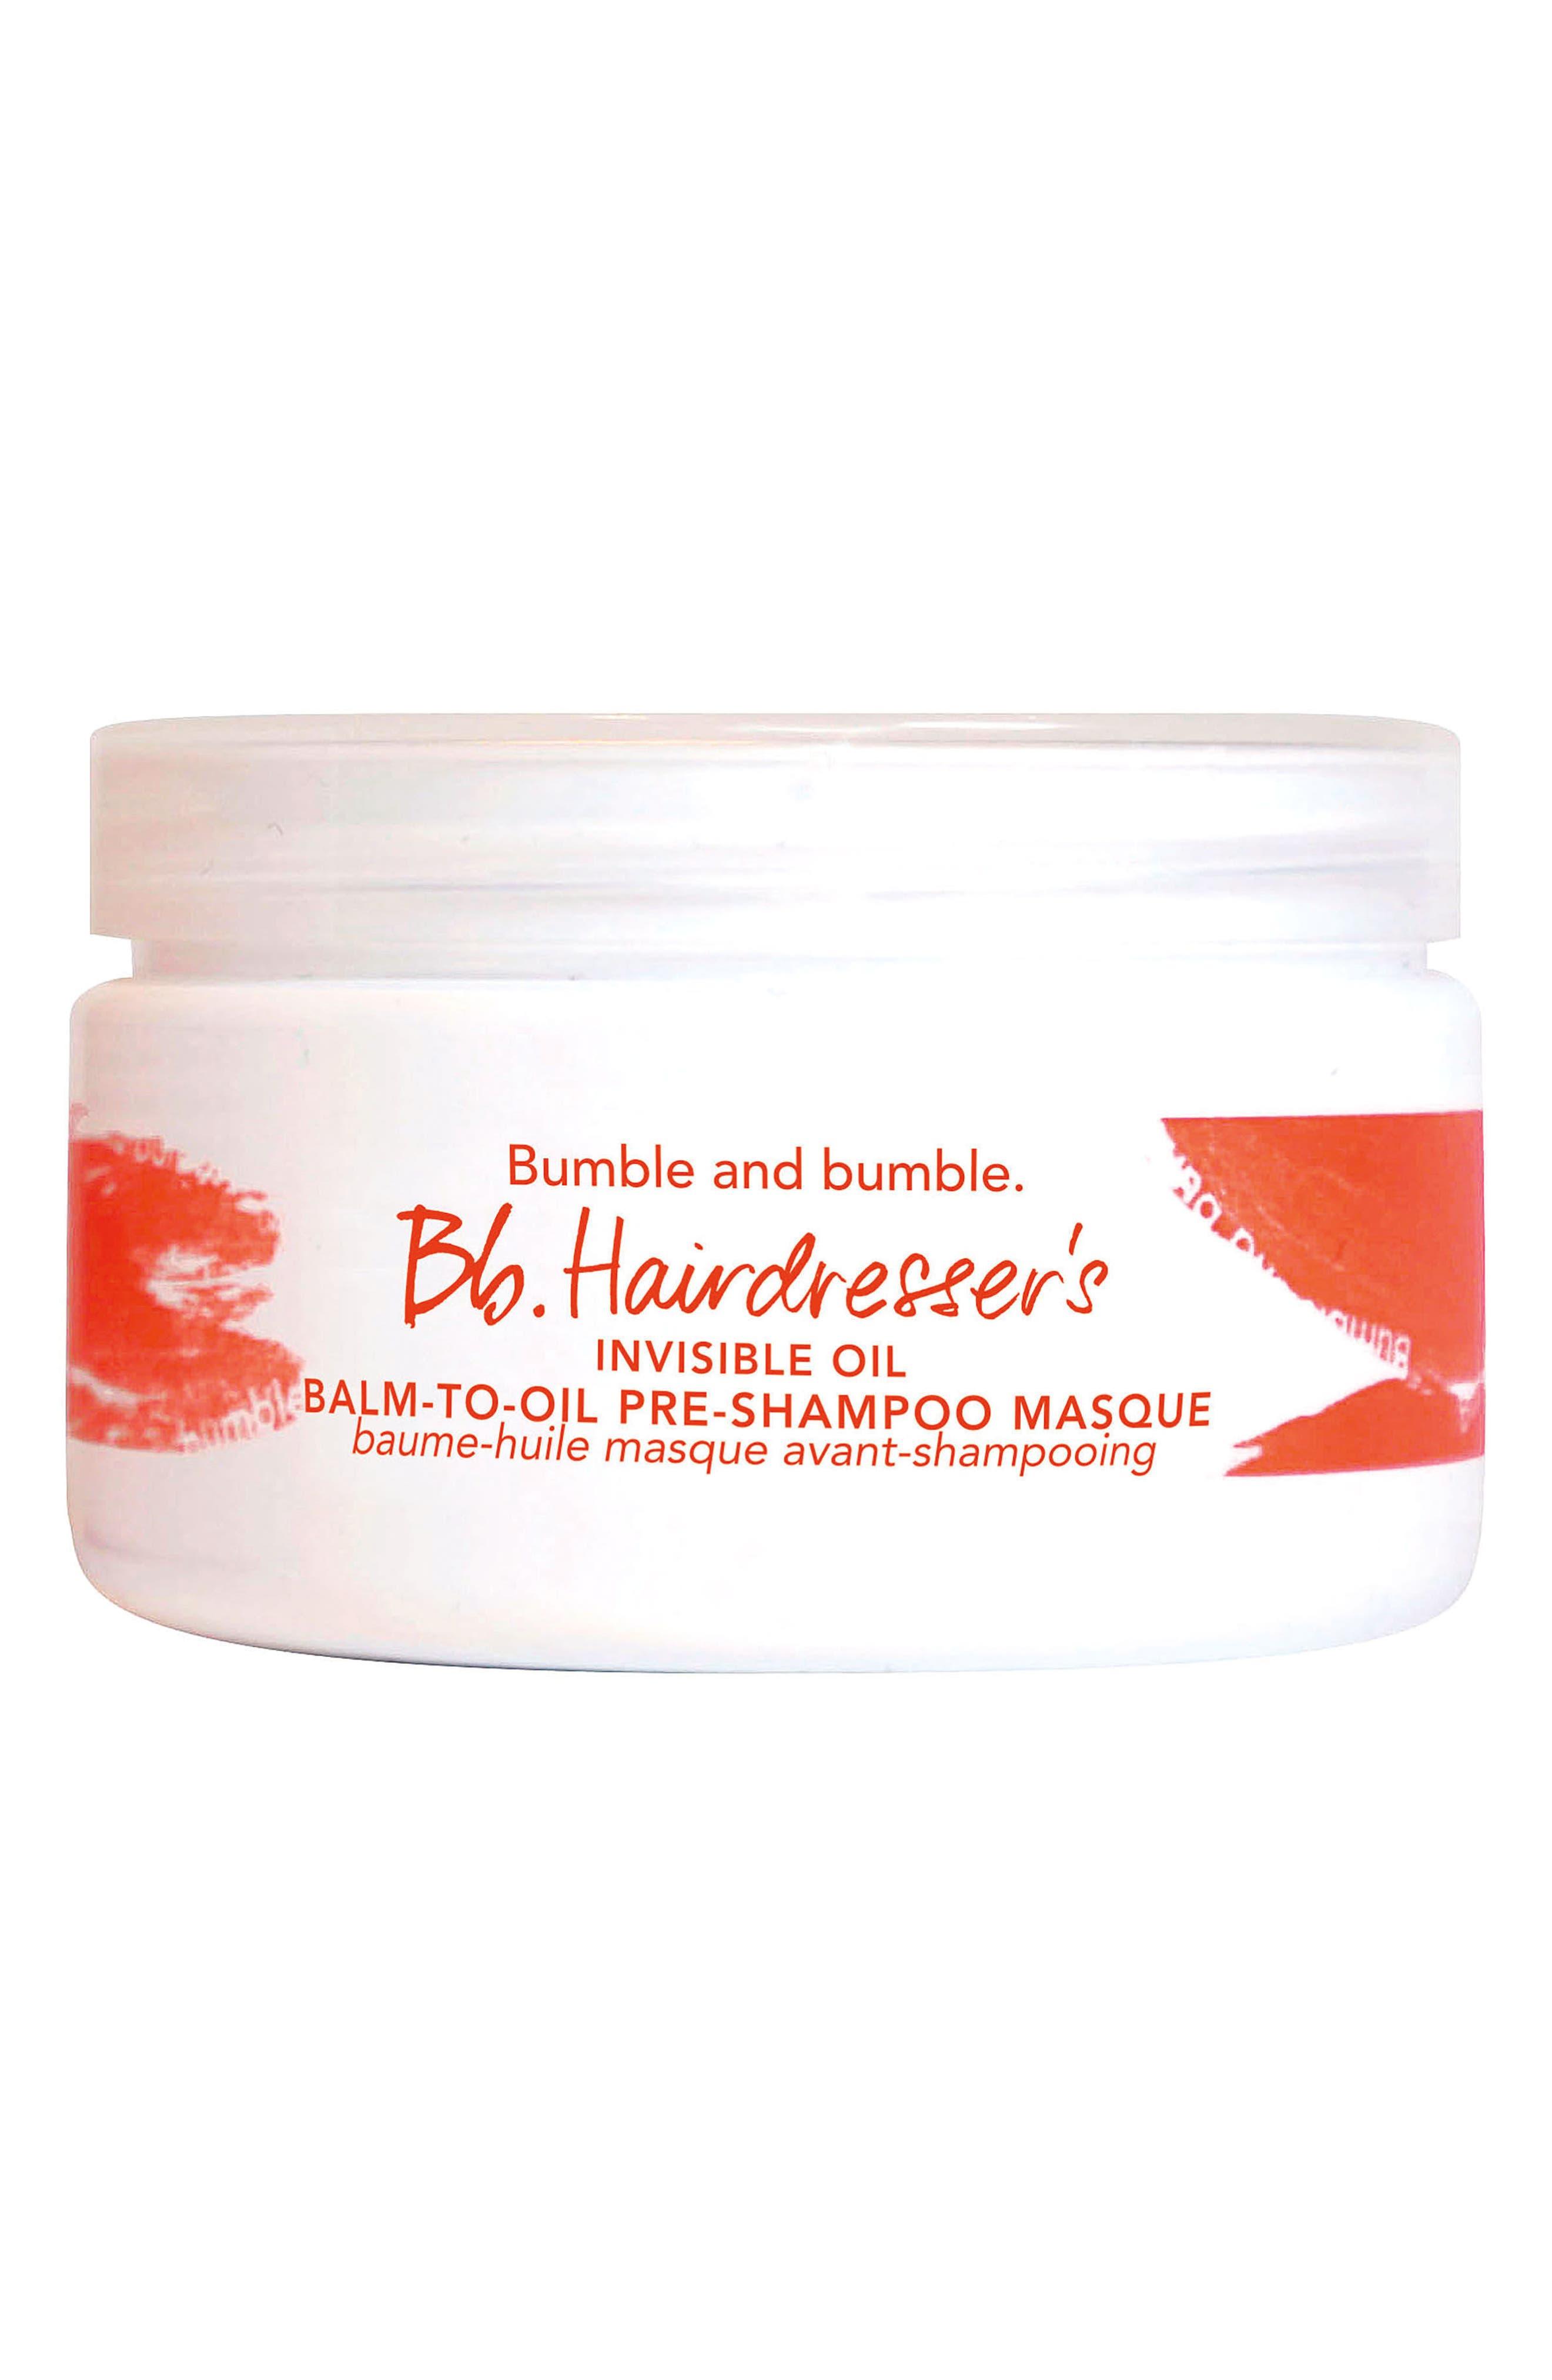 Hairdresser's Invisible Oil Balm-to-Oil Pre-Shampoo Masque,                         Main,                         color, No Color